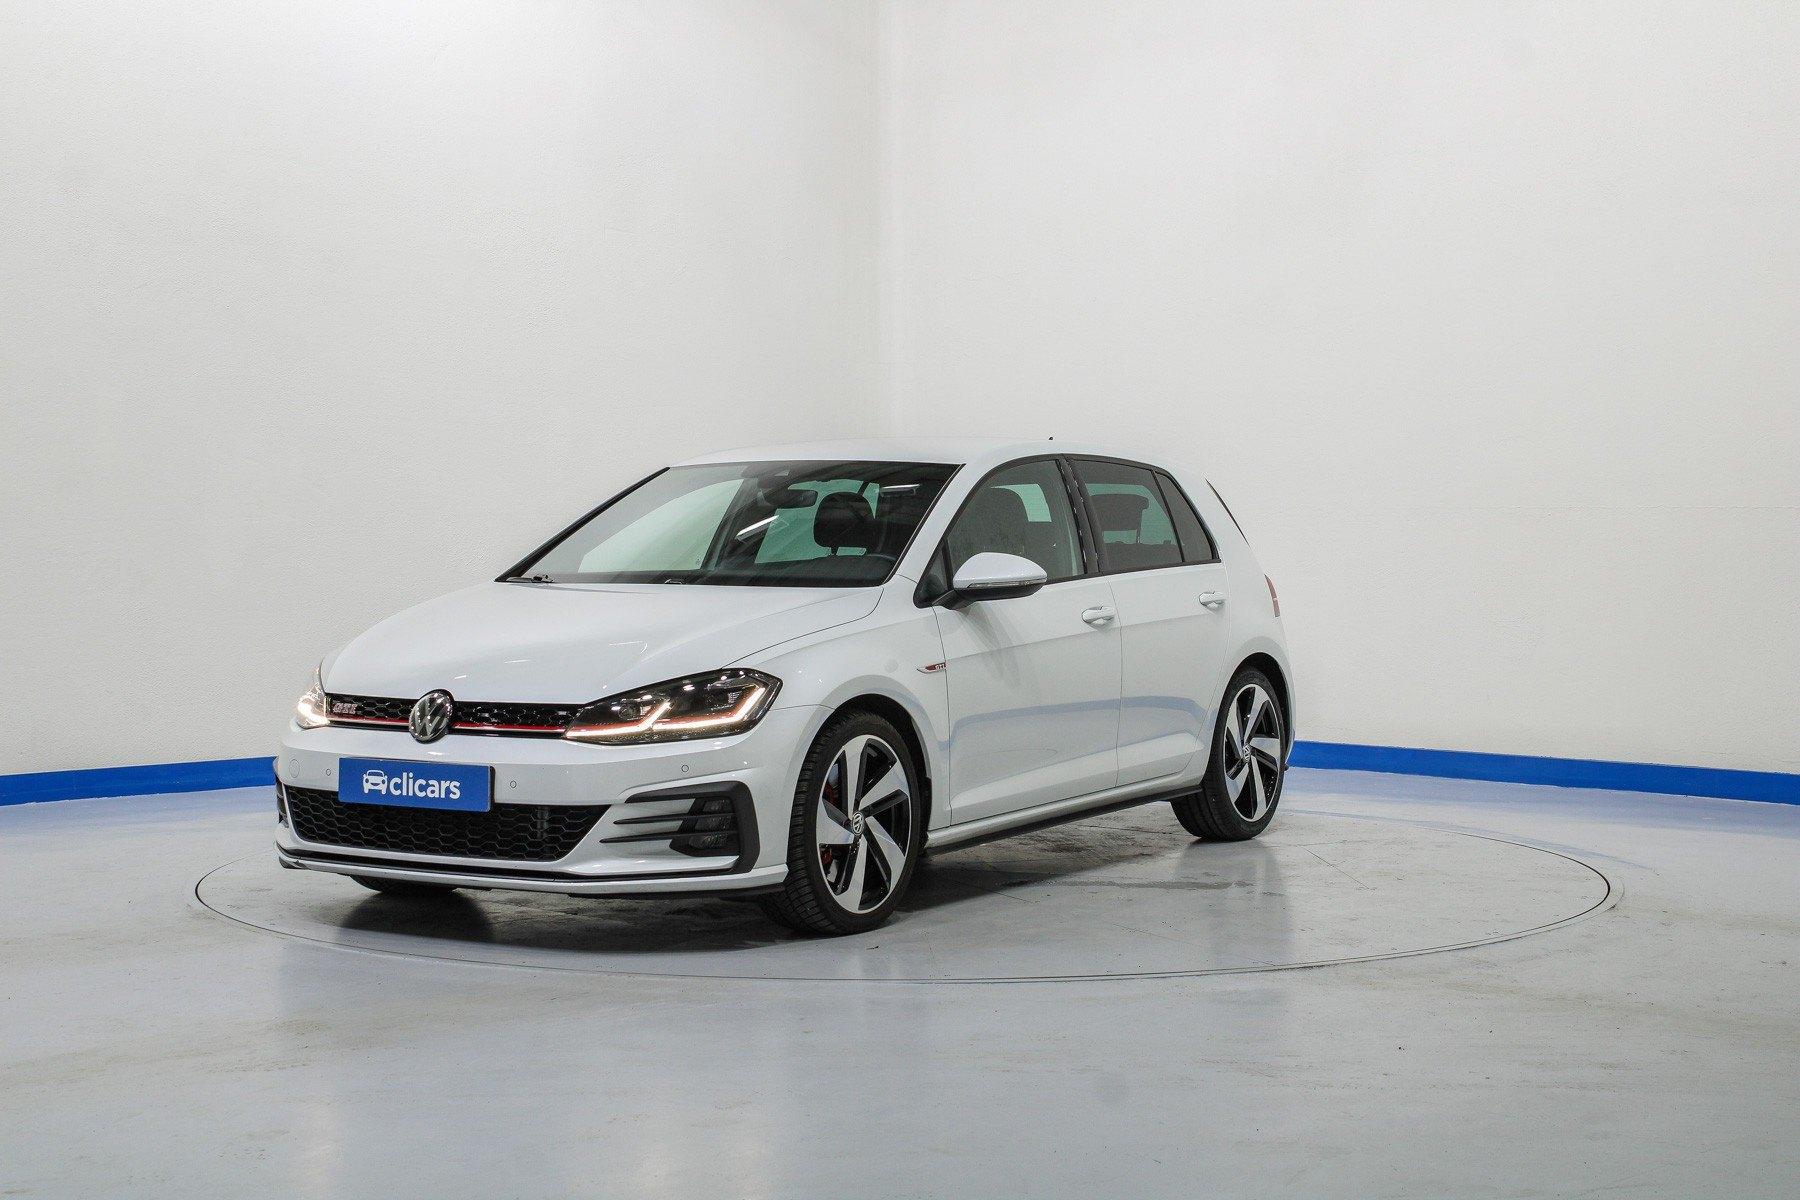 Volkswagen Golf Gasolina GTI Performance 2.0 TSI 180kW(245CV) DSG 1